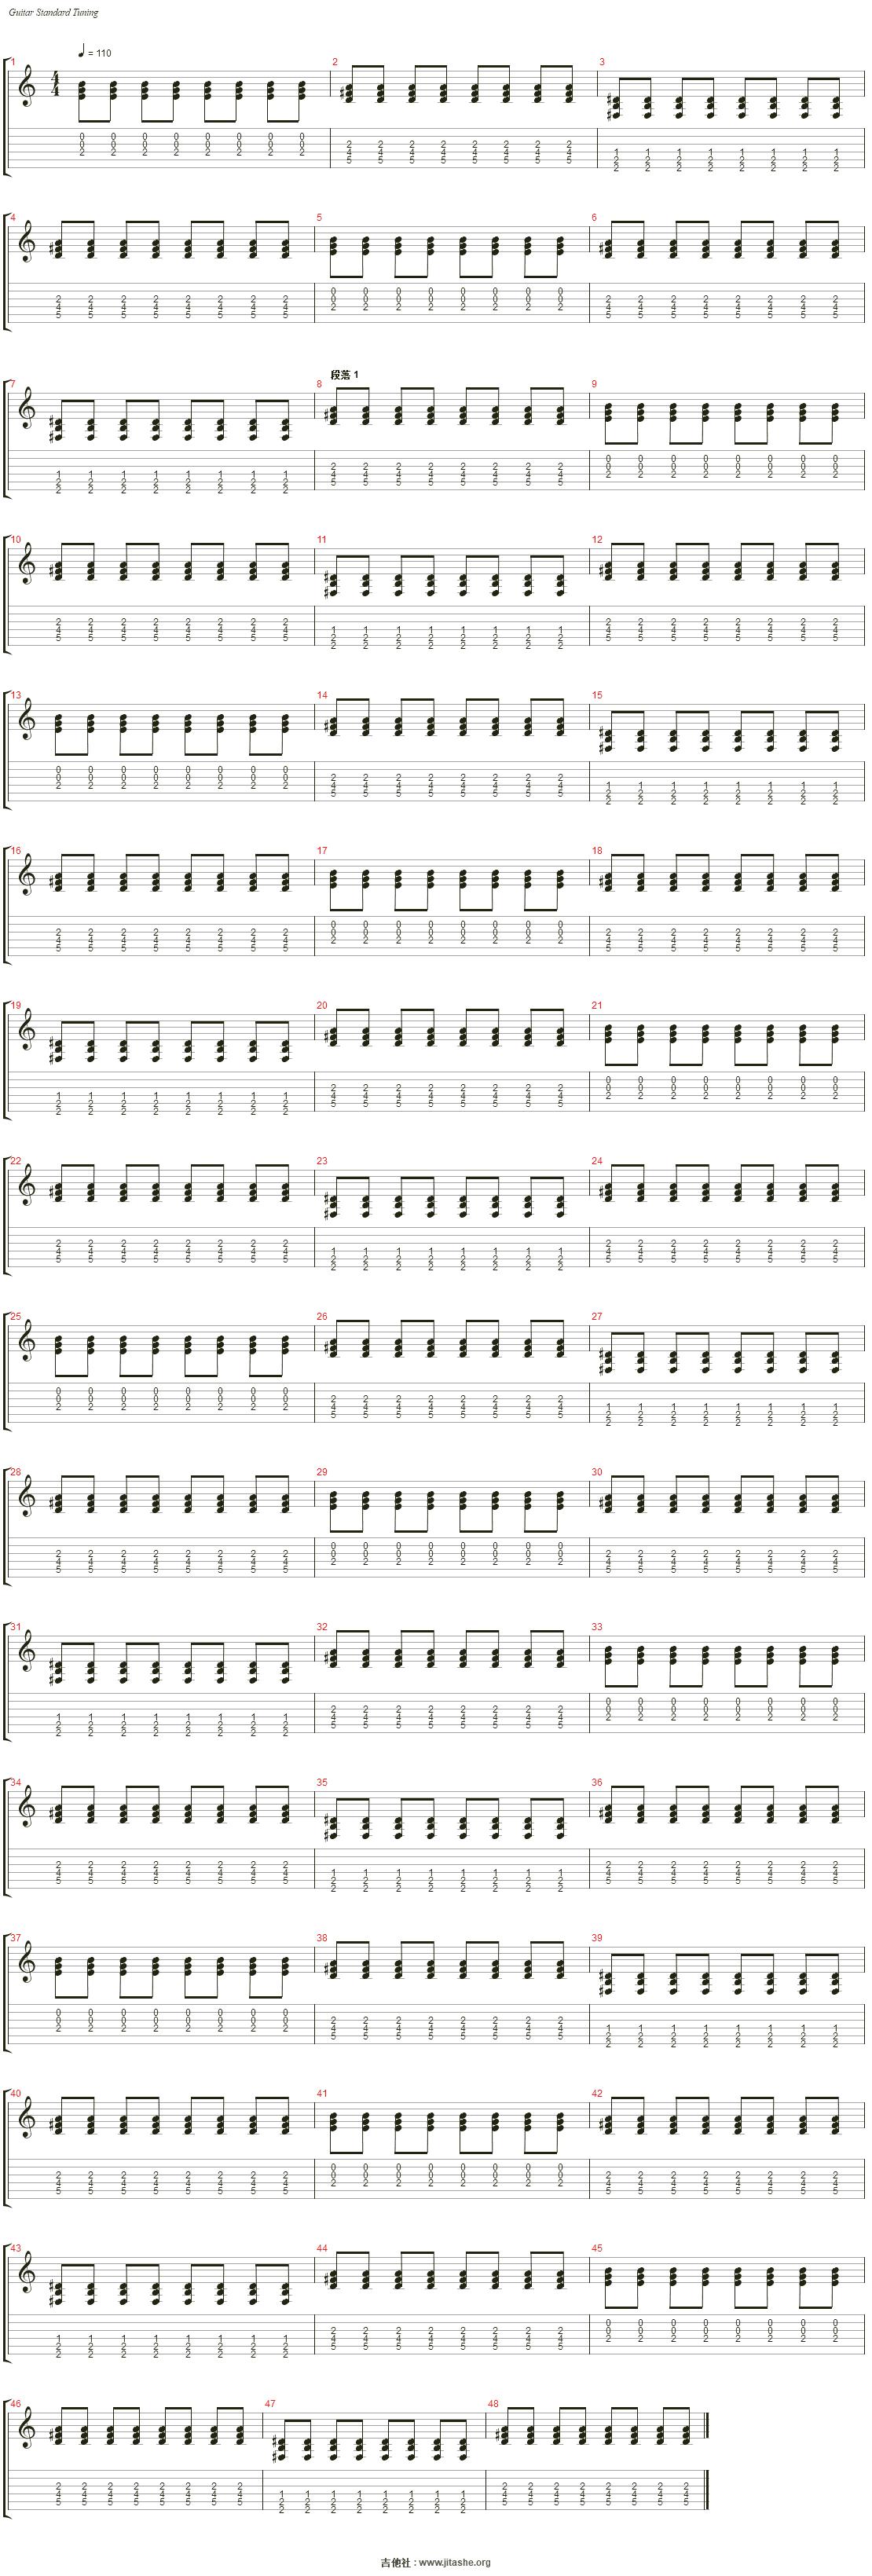 Time吉他谱(音轨 3)_MKJ